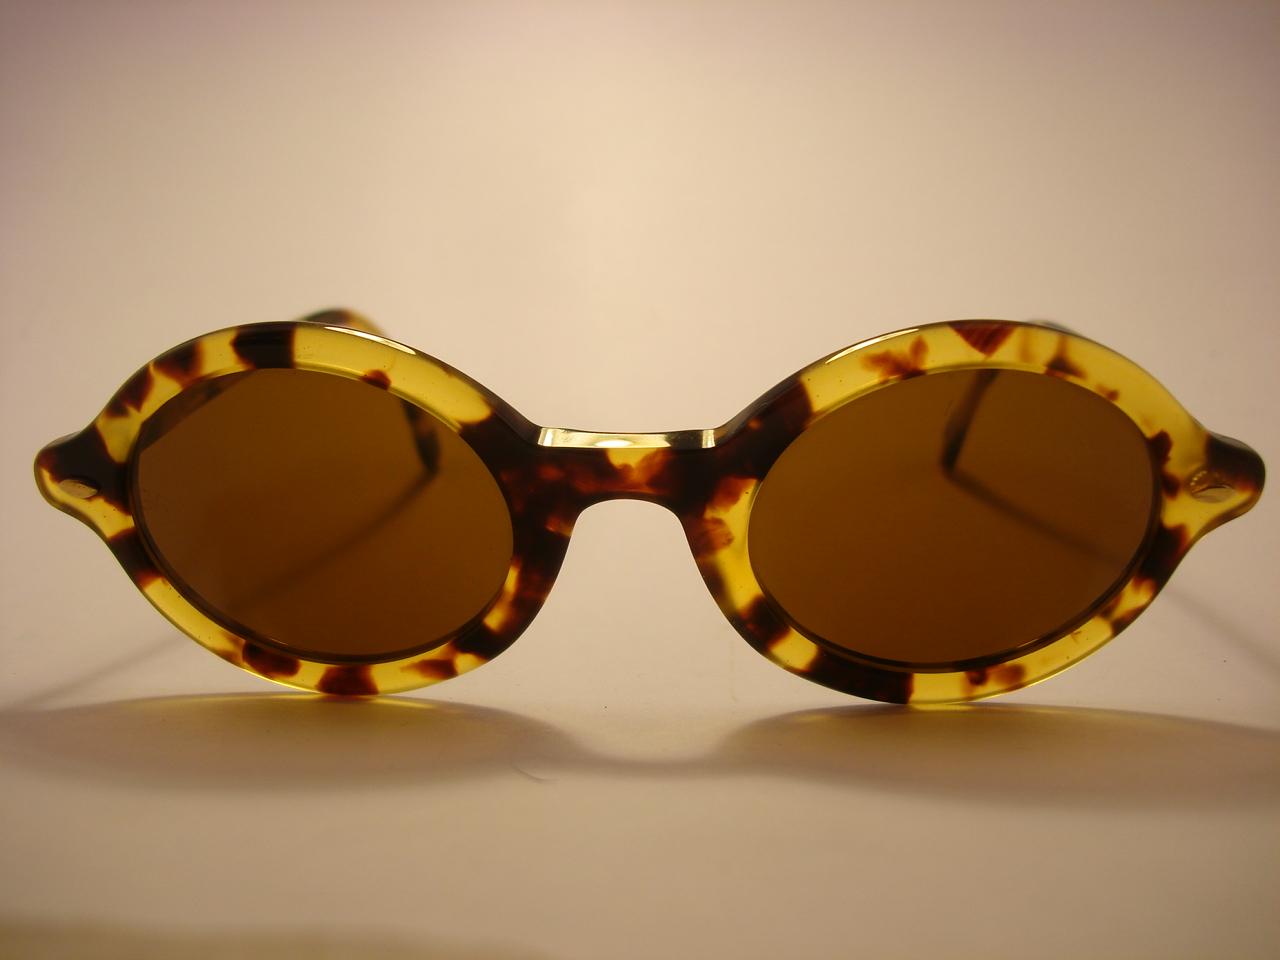 bc3c49feb8 Giorgio Armani Vintage Round Sunglasses